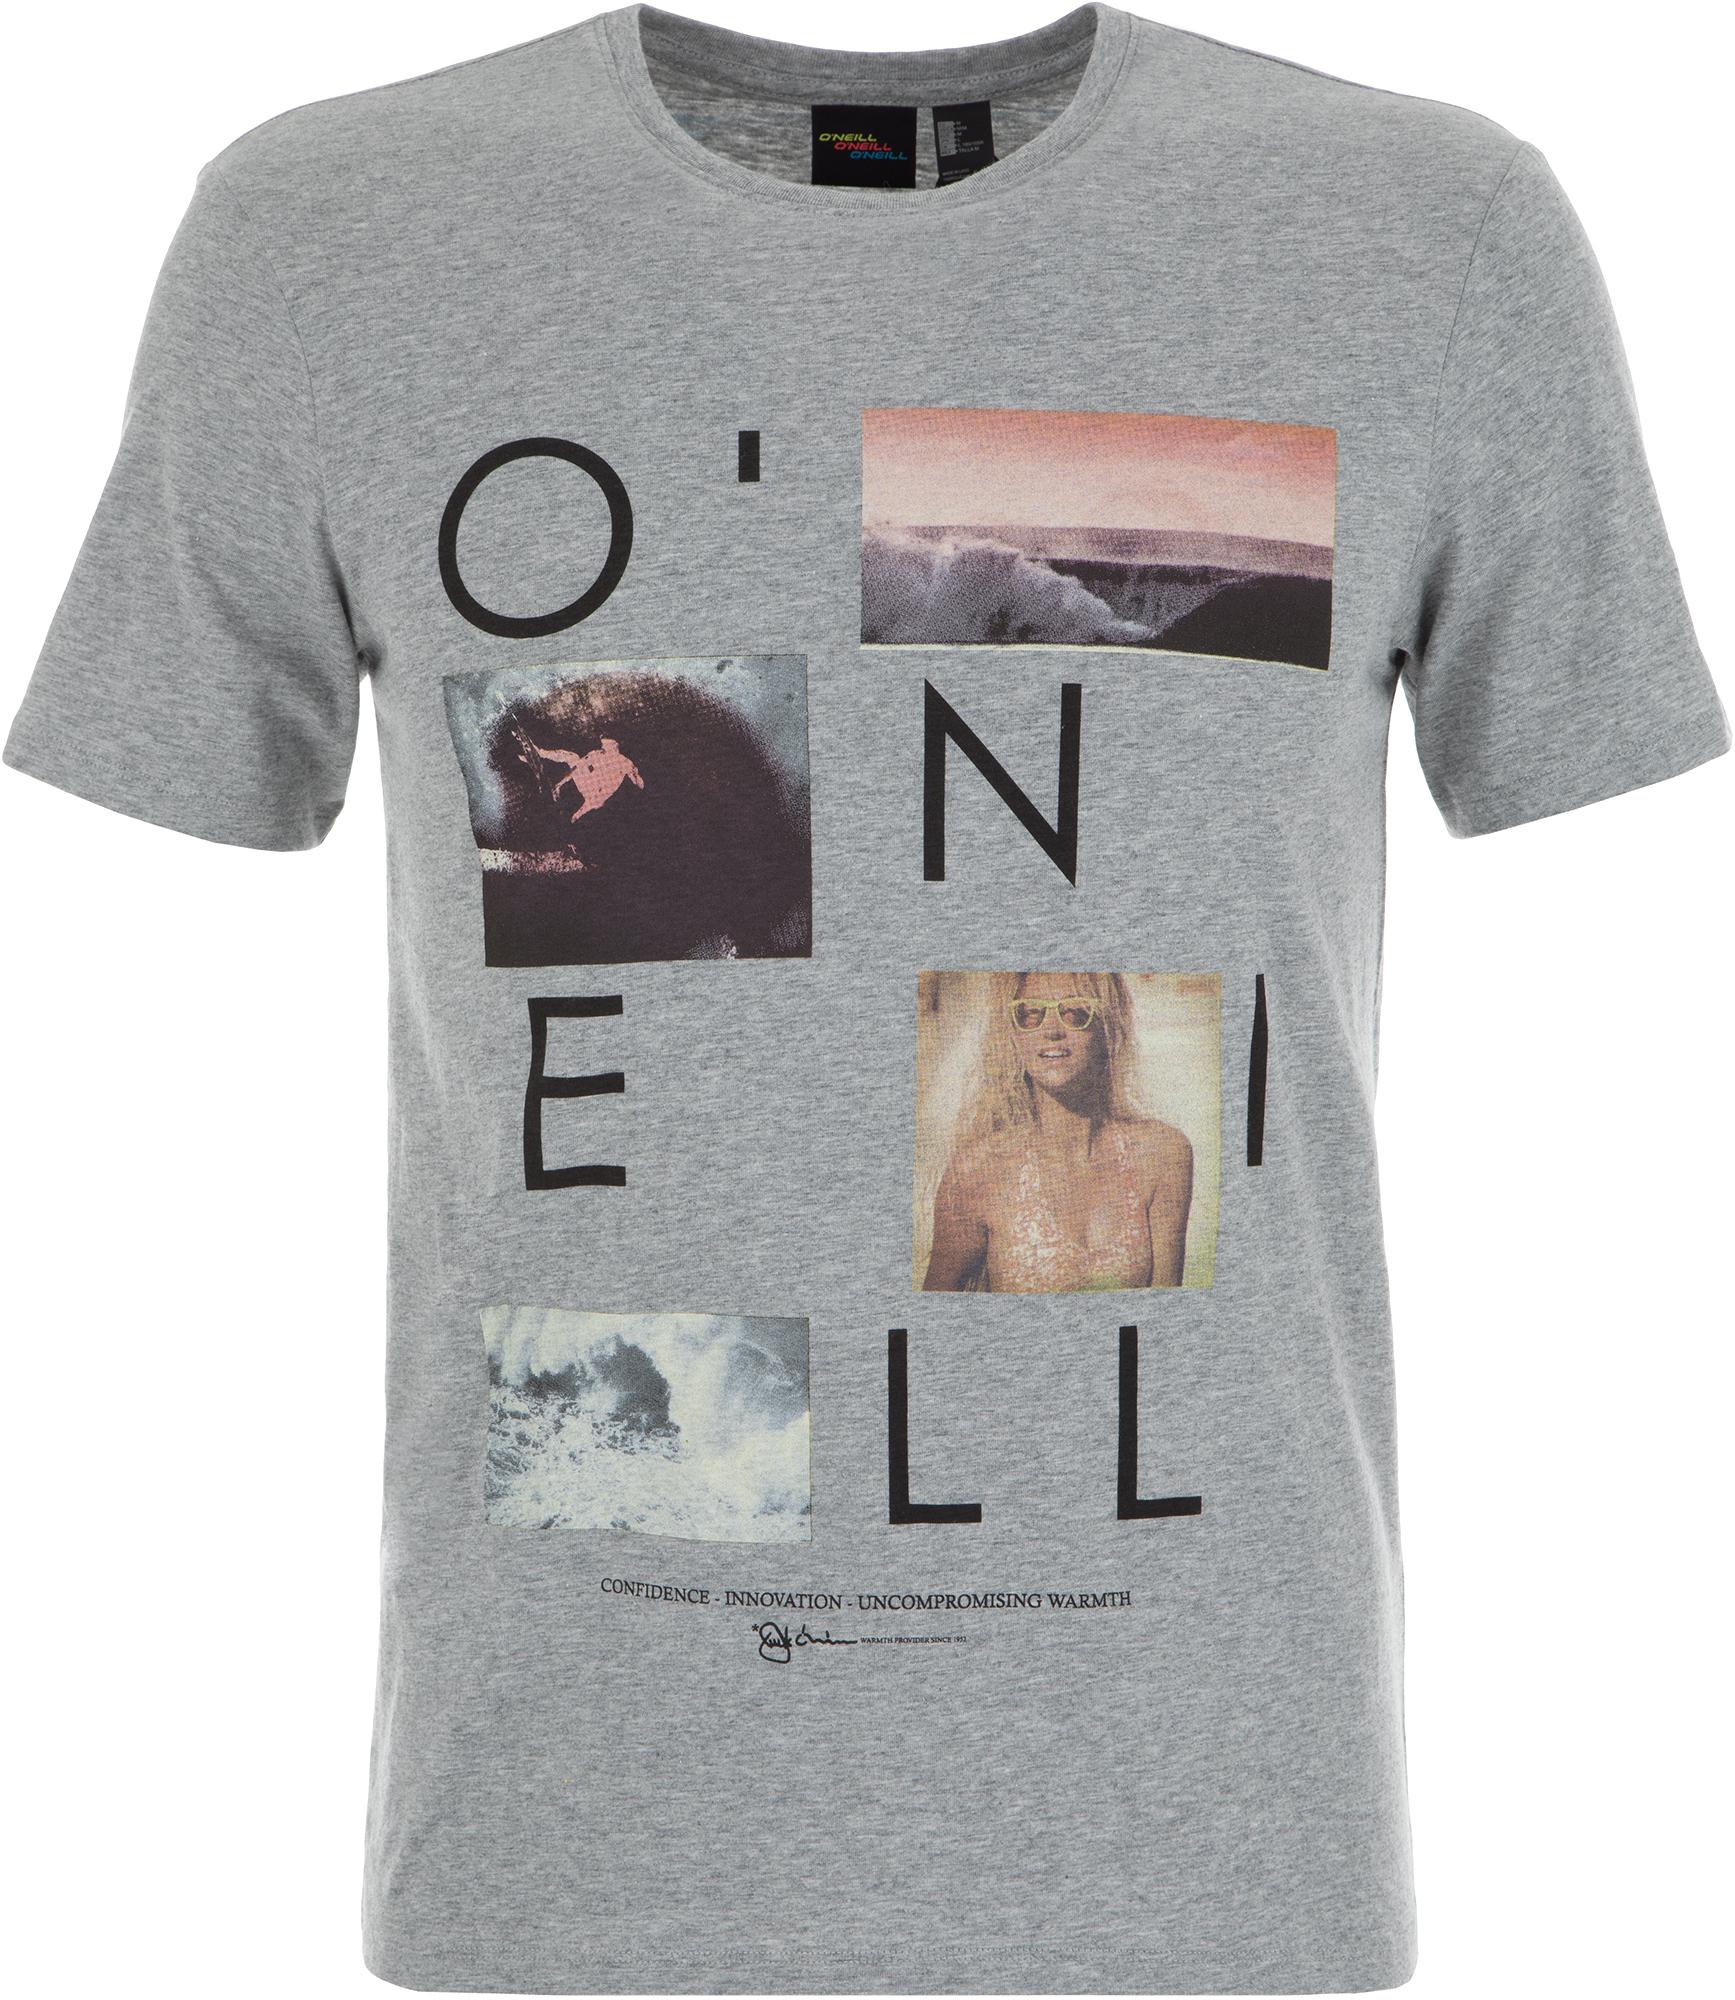 O'Neill Футболка мужская O'Neill Lm Neos, размер 52-54